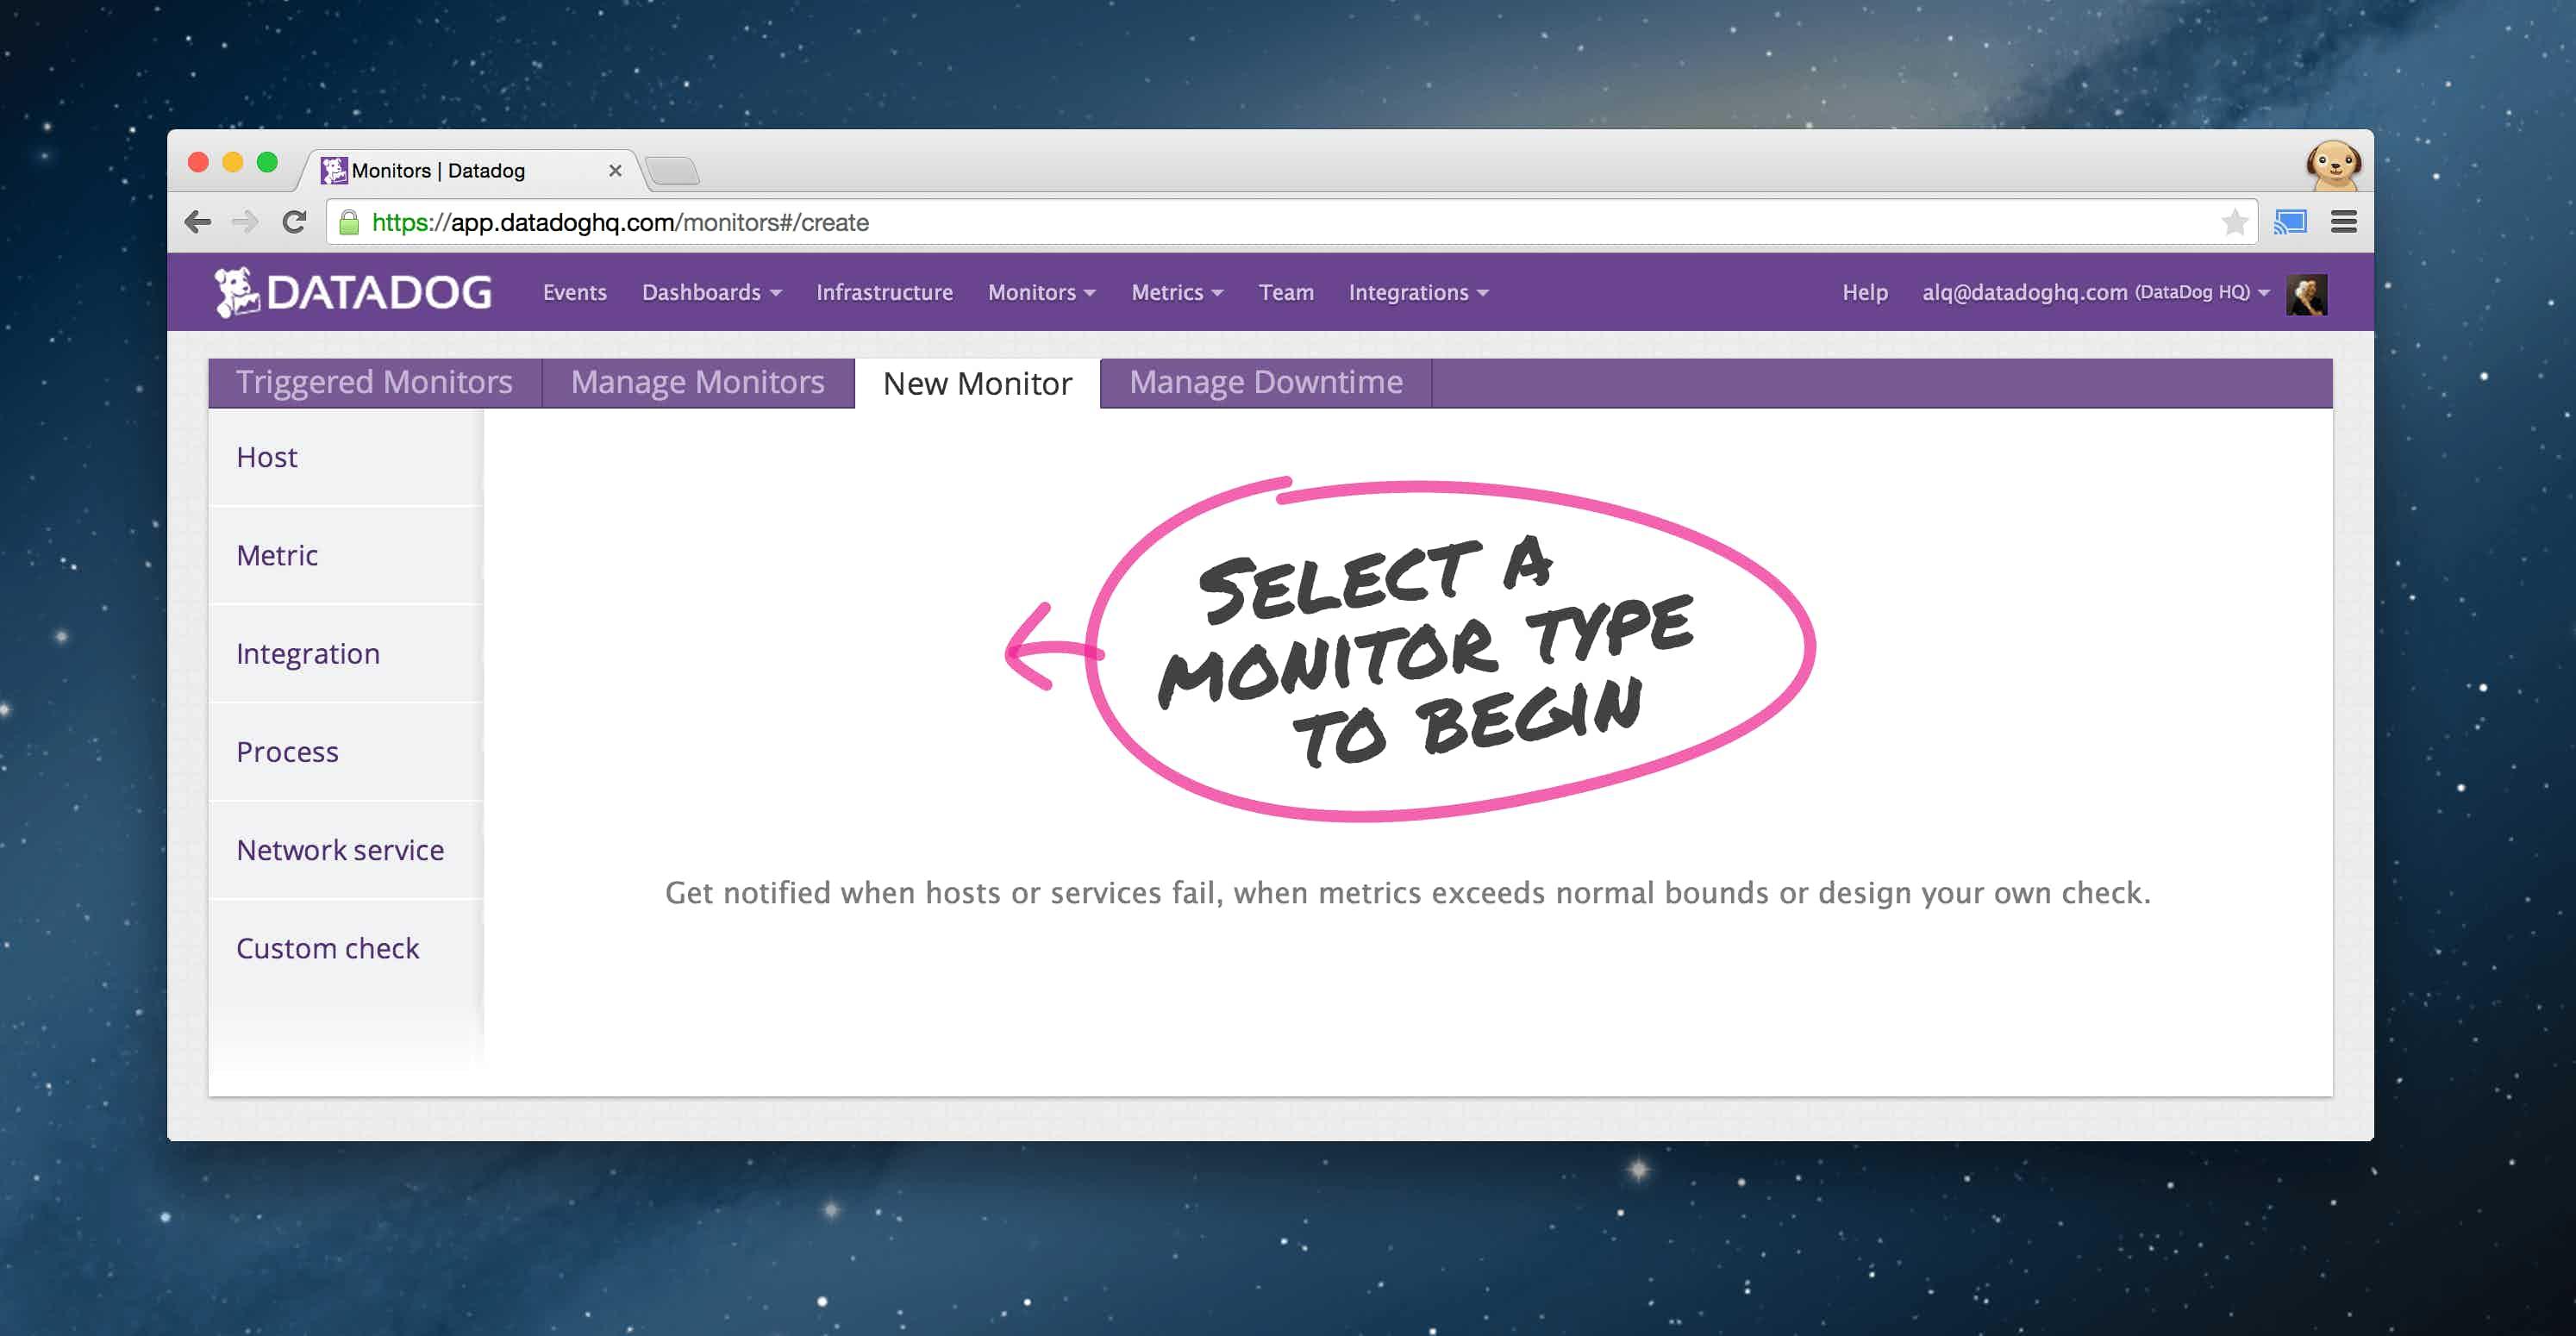 Monitors---Datadog